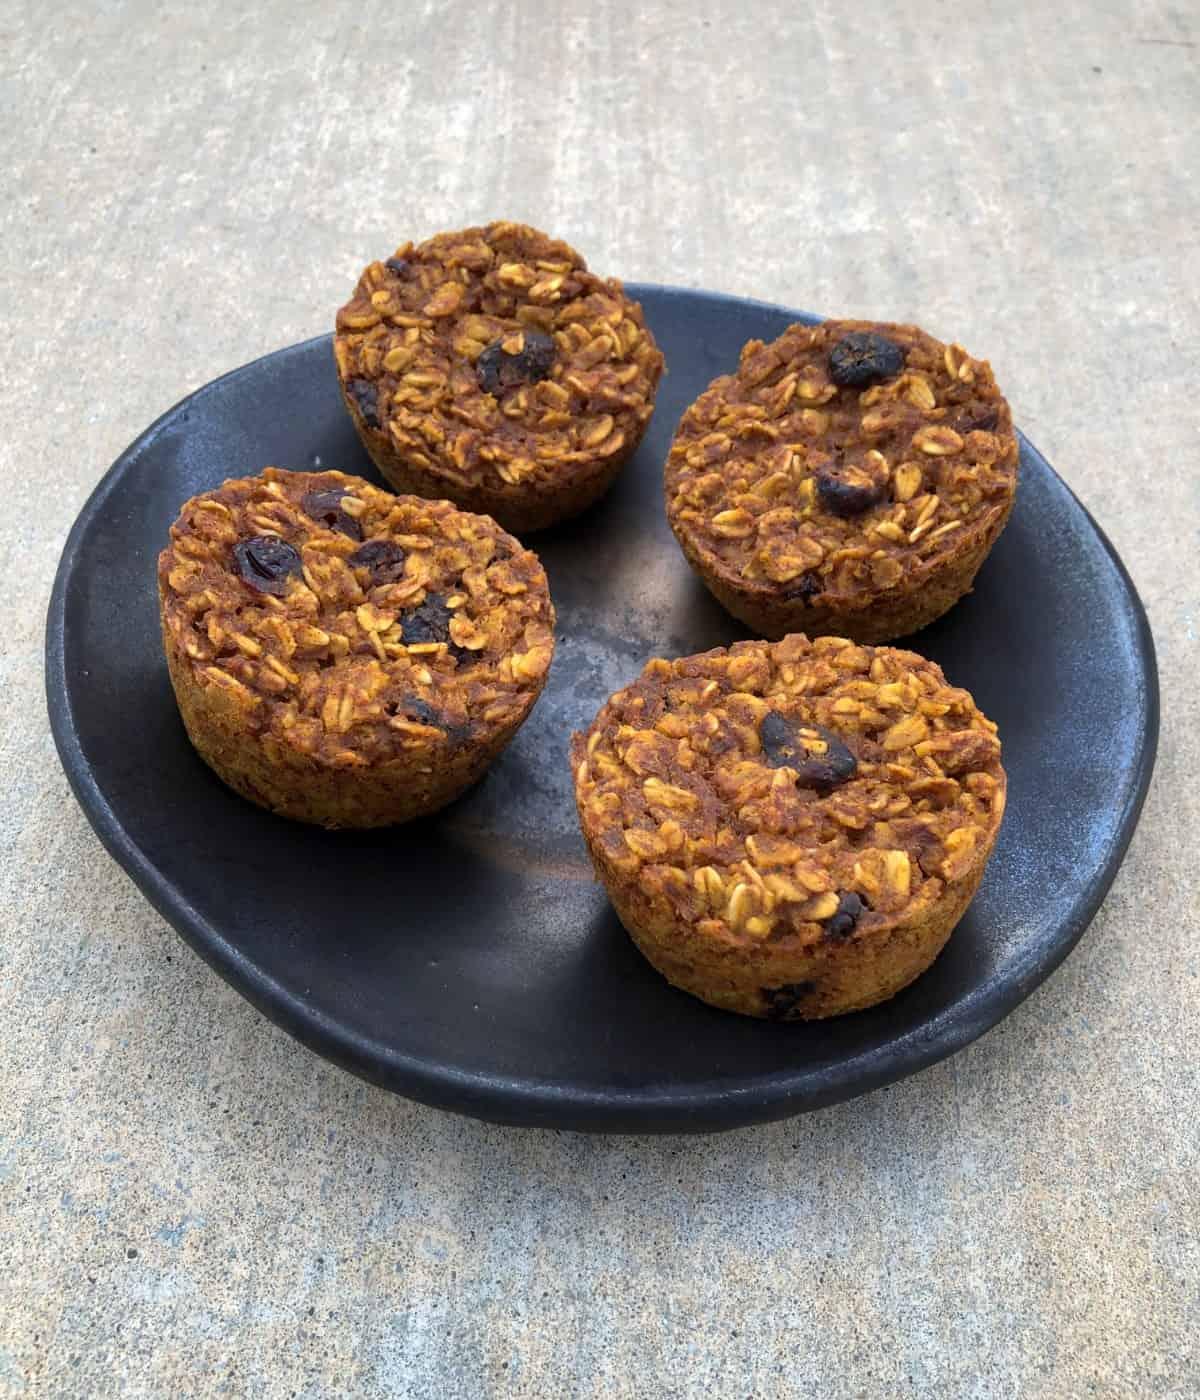 Pumpkin oatmeal muffin cups on brown ceramic plate.